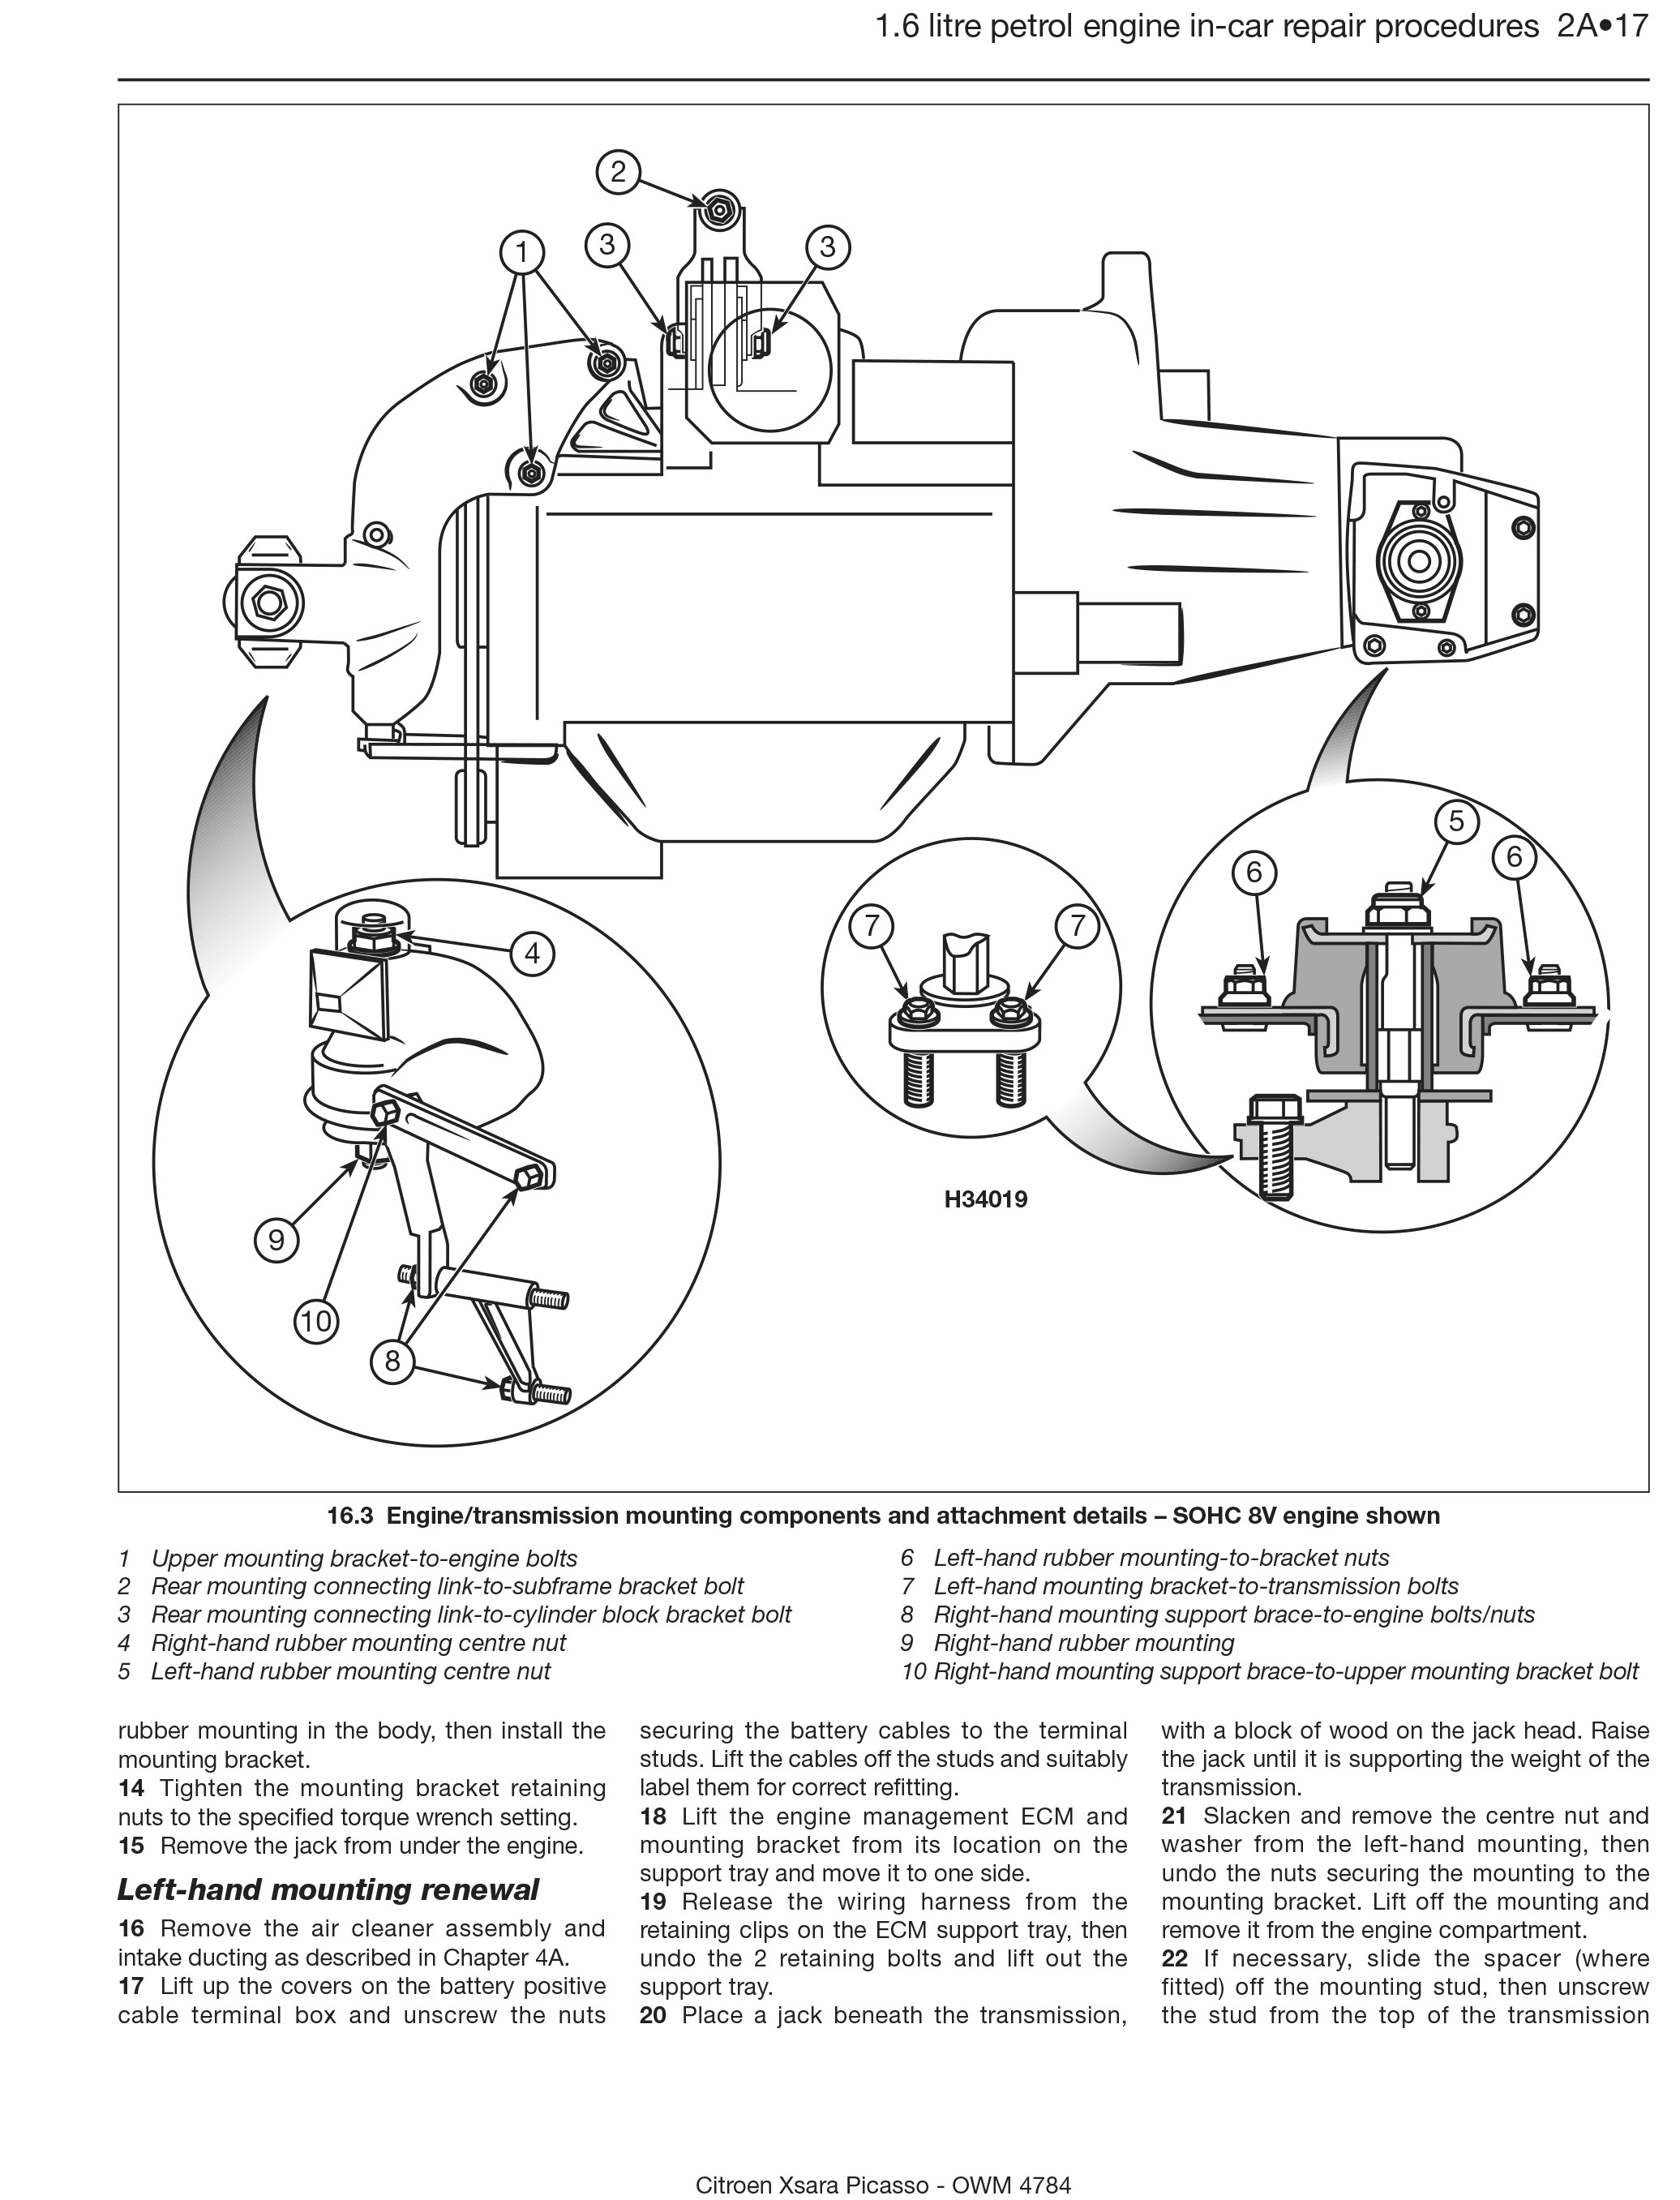 Citroen Xsara Pico (2004 - 2008) Repair Manuals on